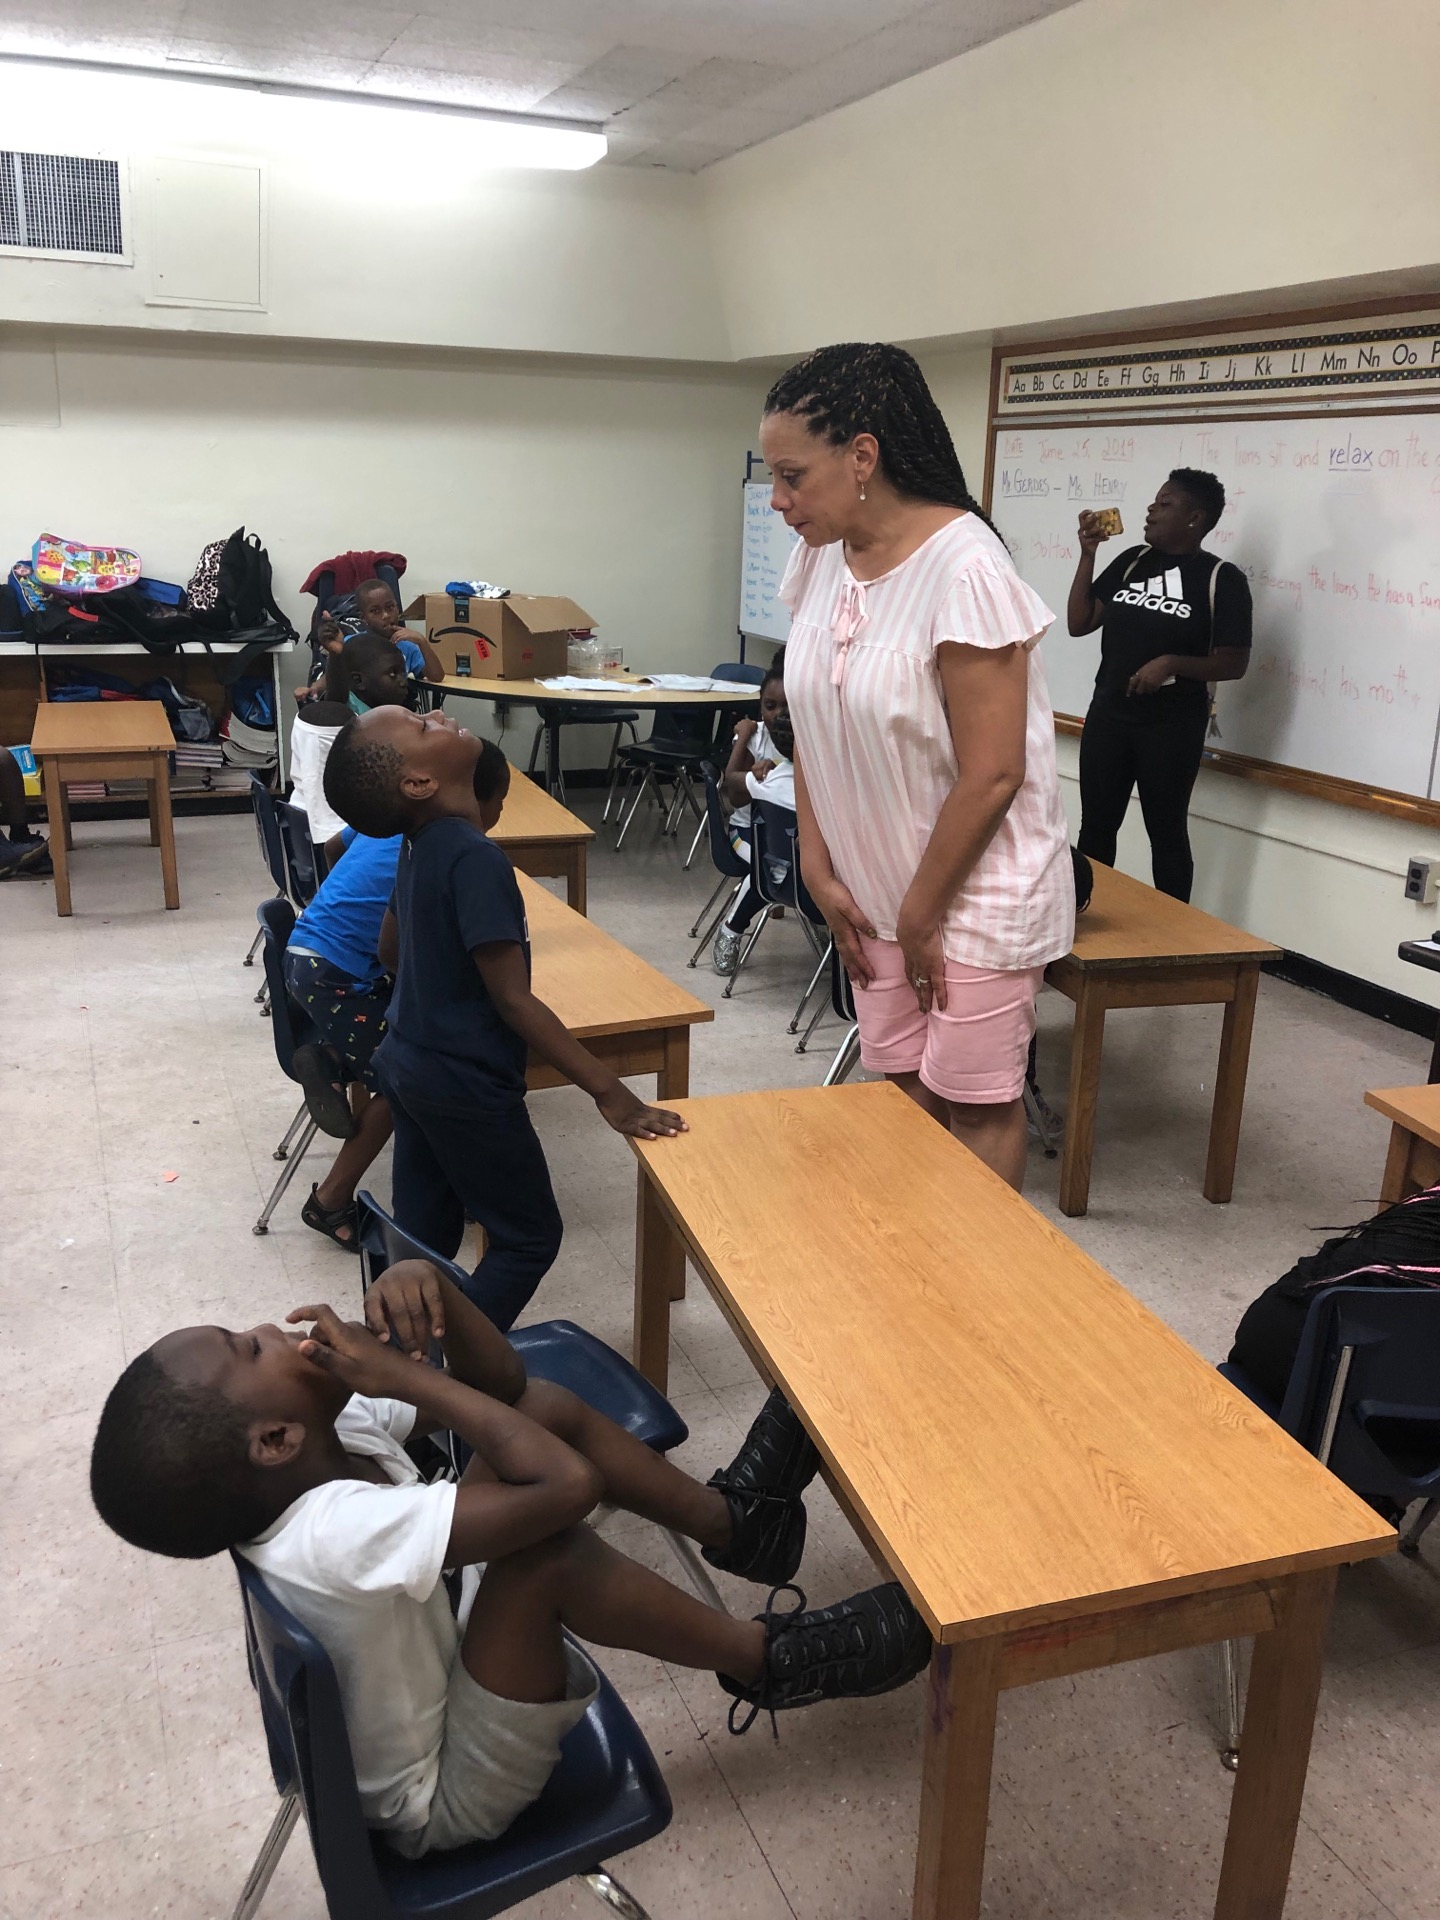 MCI classrooms - New Covenant Worship Center in Miami, FL